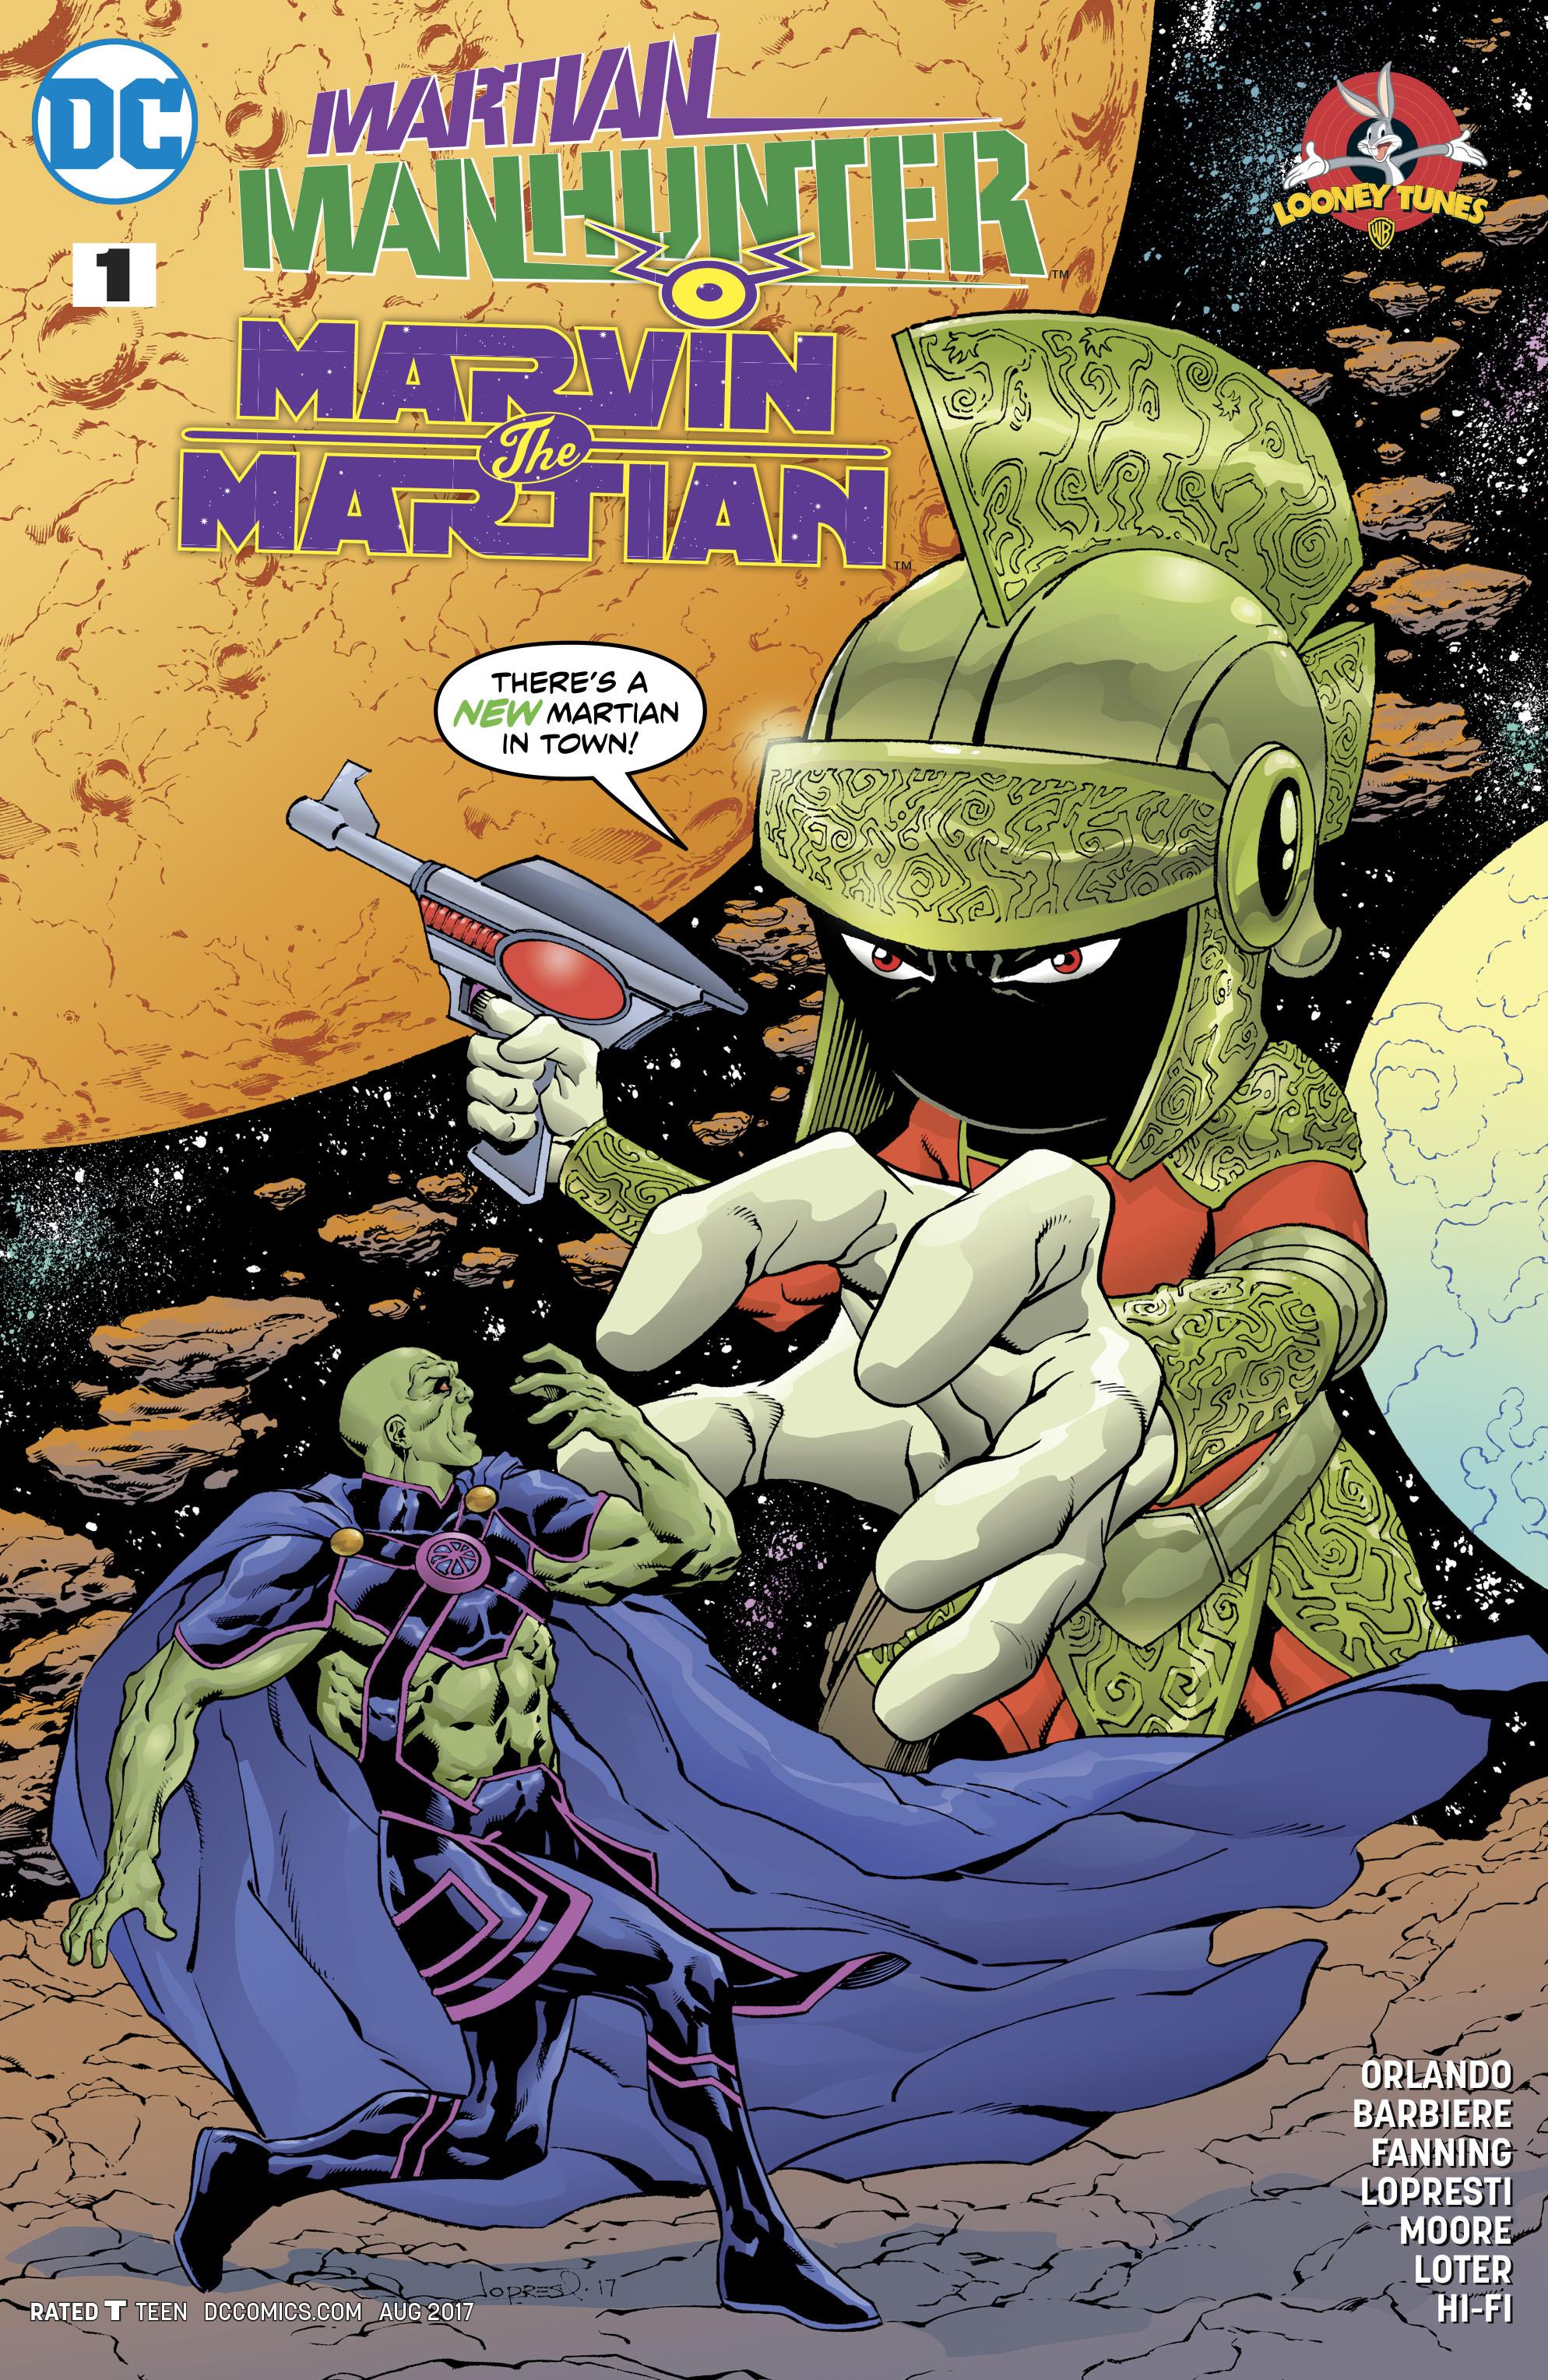 Read online Martian Manhunter/Marvin the Martian Special comic -  Issue # Full - 1